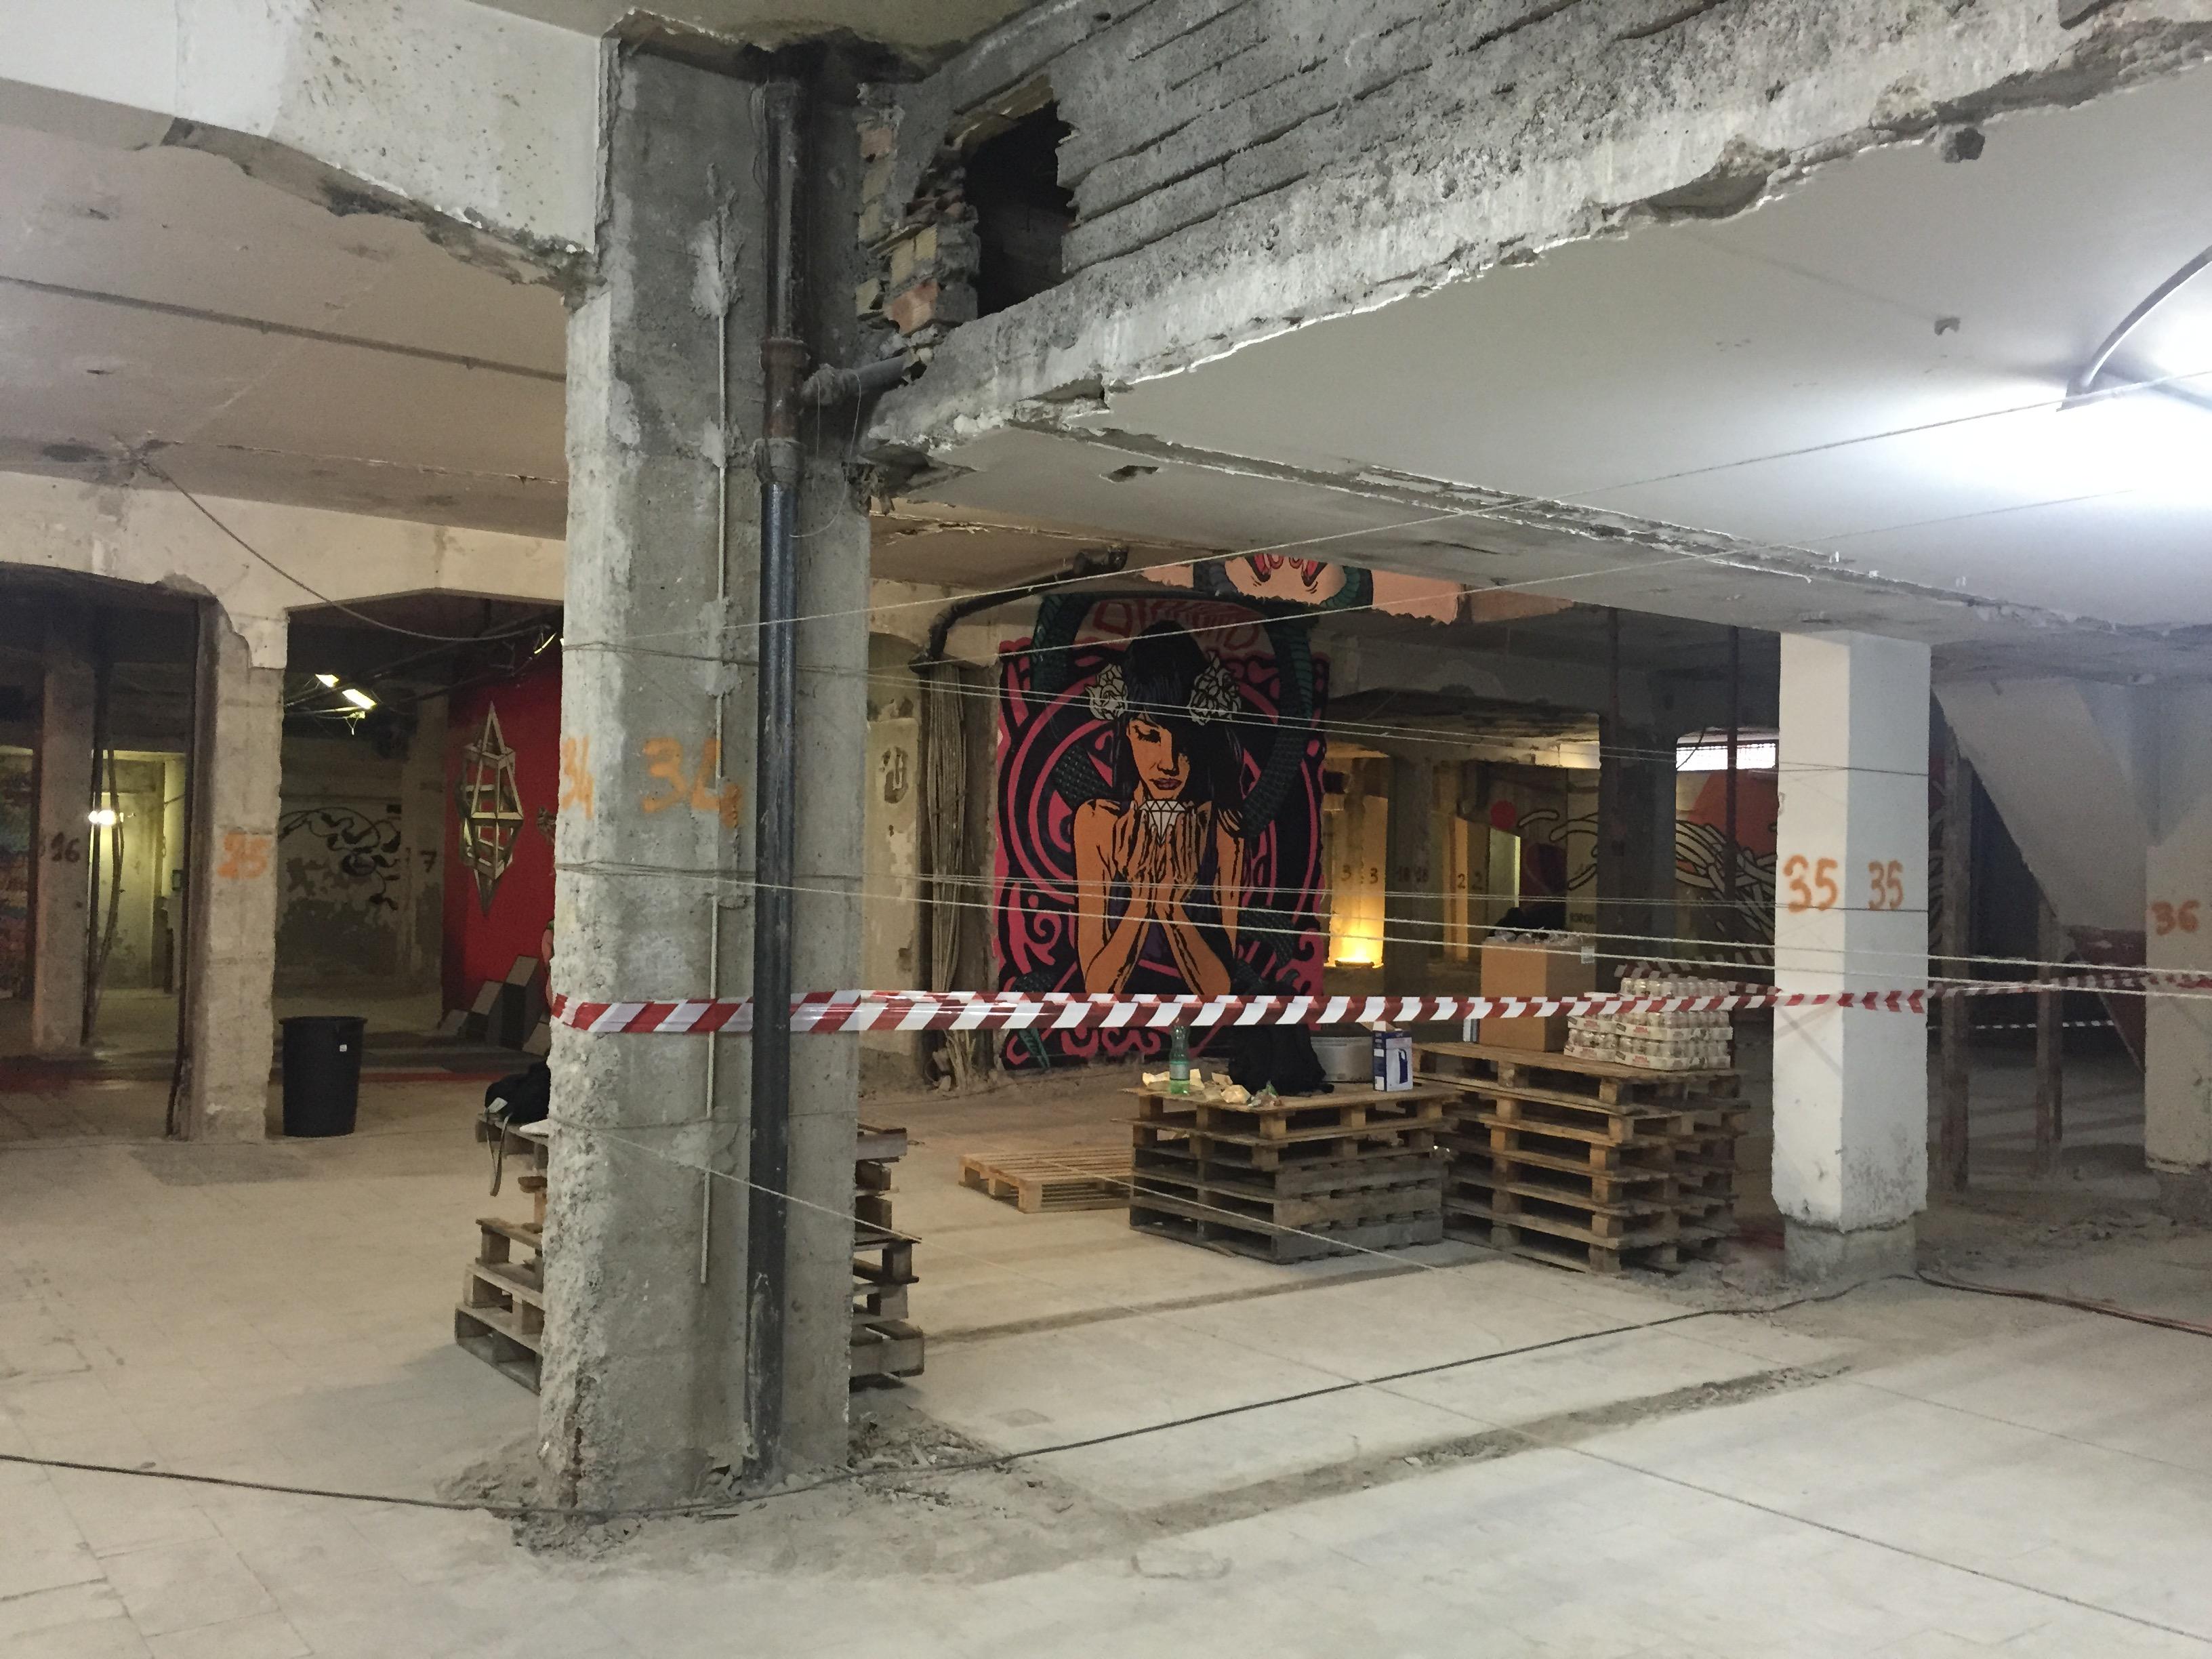 Tracce temporaneem roma klevra finestre artribune - Pizzeria le finestre roma ...